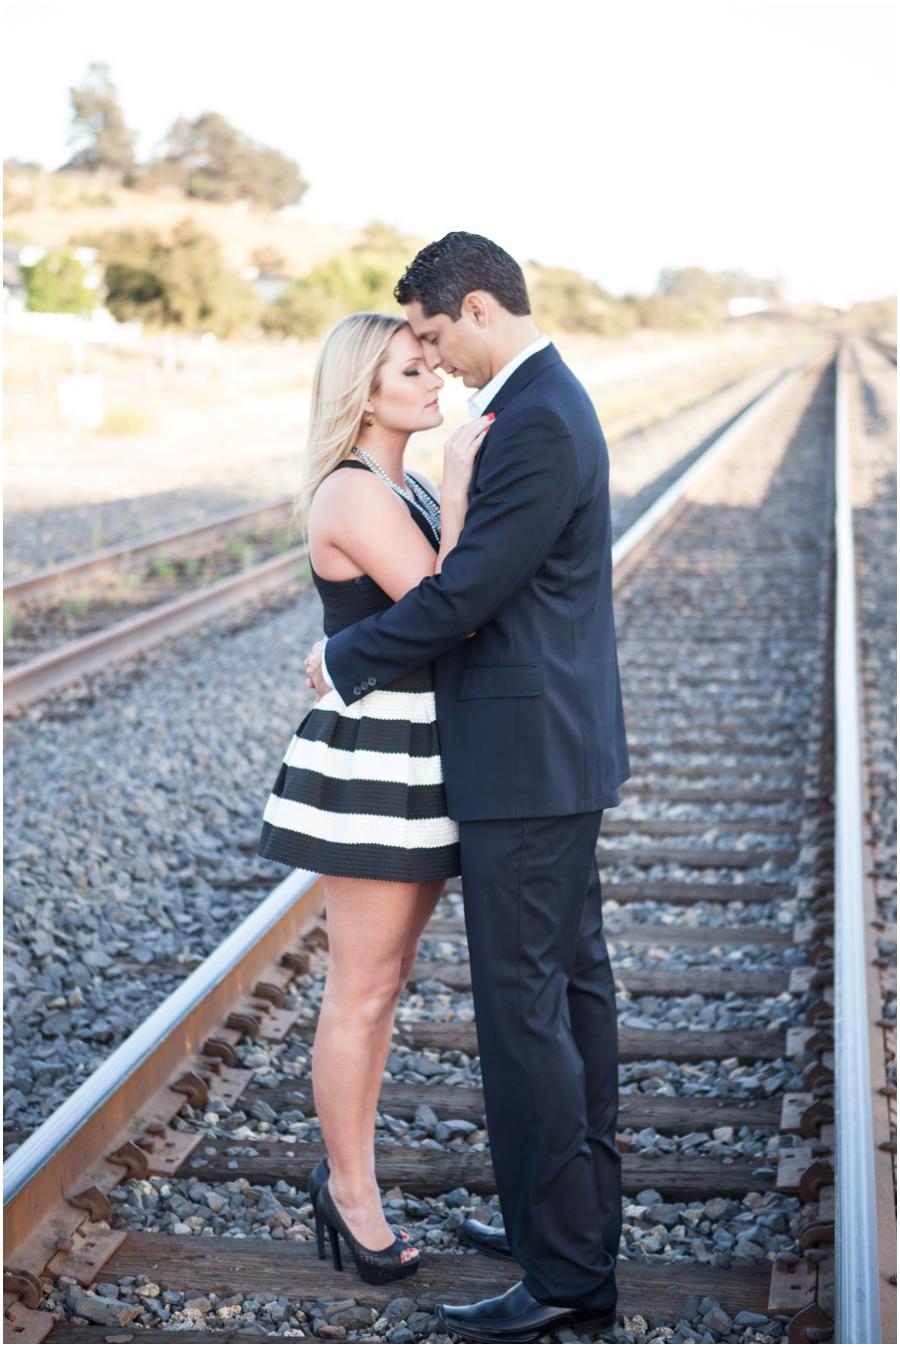 Skyla Walton San Luis Obispo central coast wedding photographer_0262.jpg